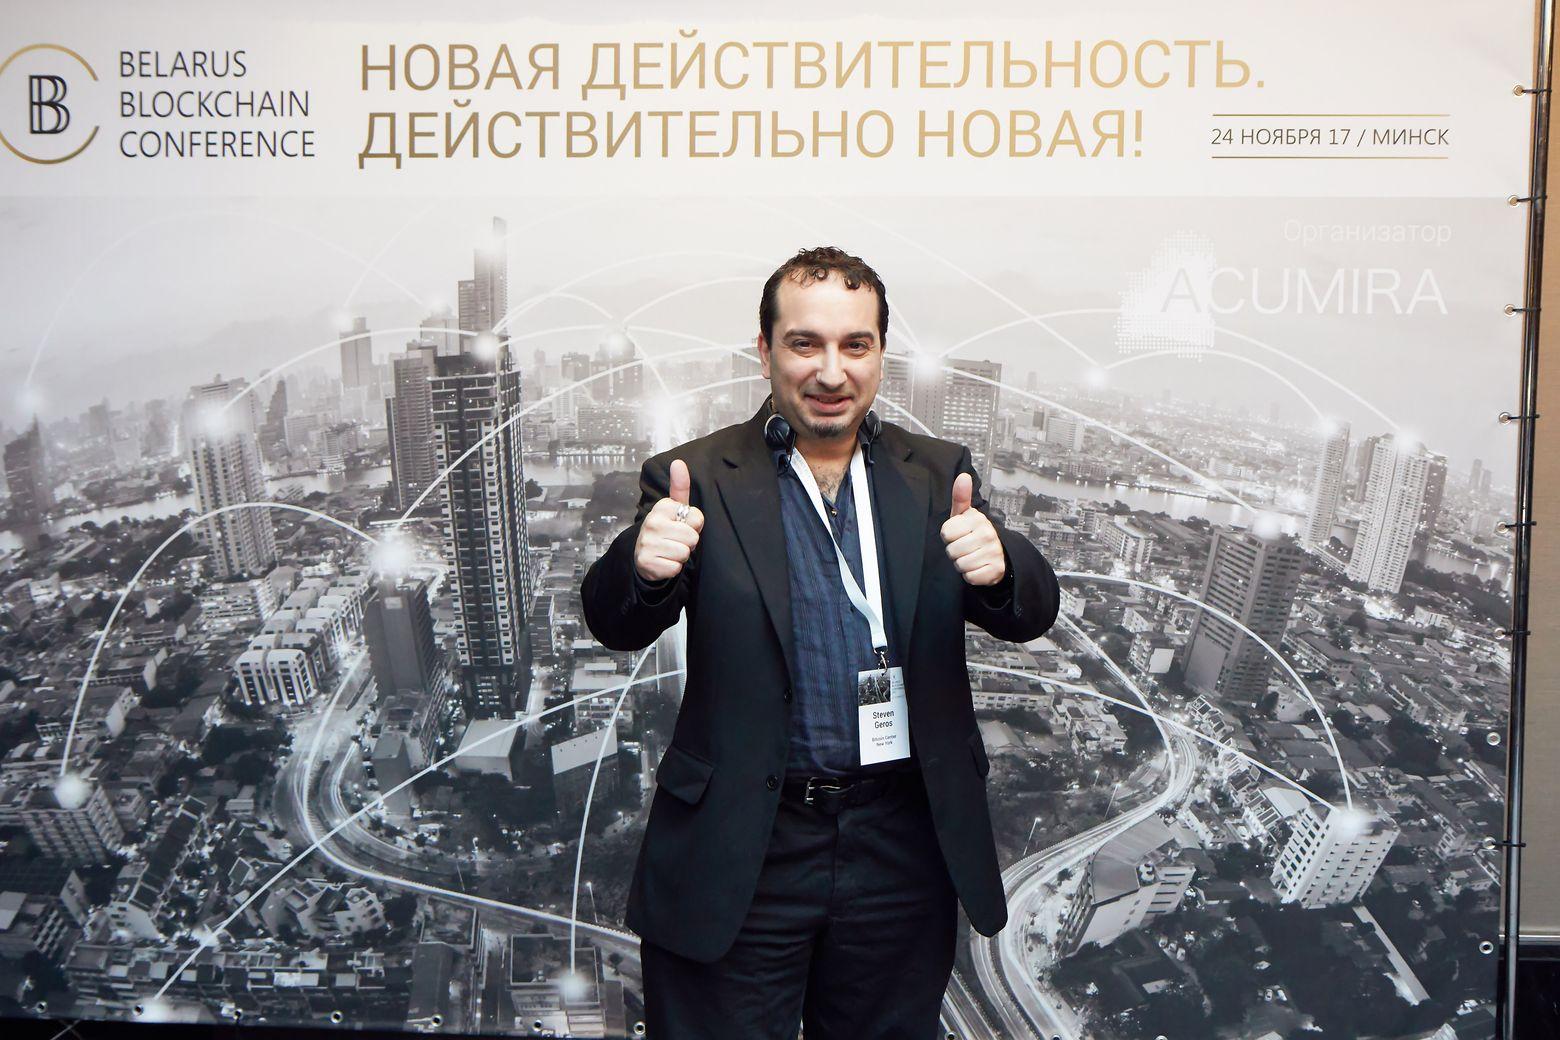 Belarus Blockchain Conference. DoubleTree by Hilton